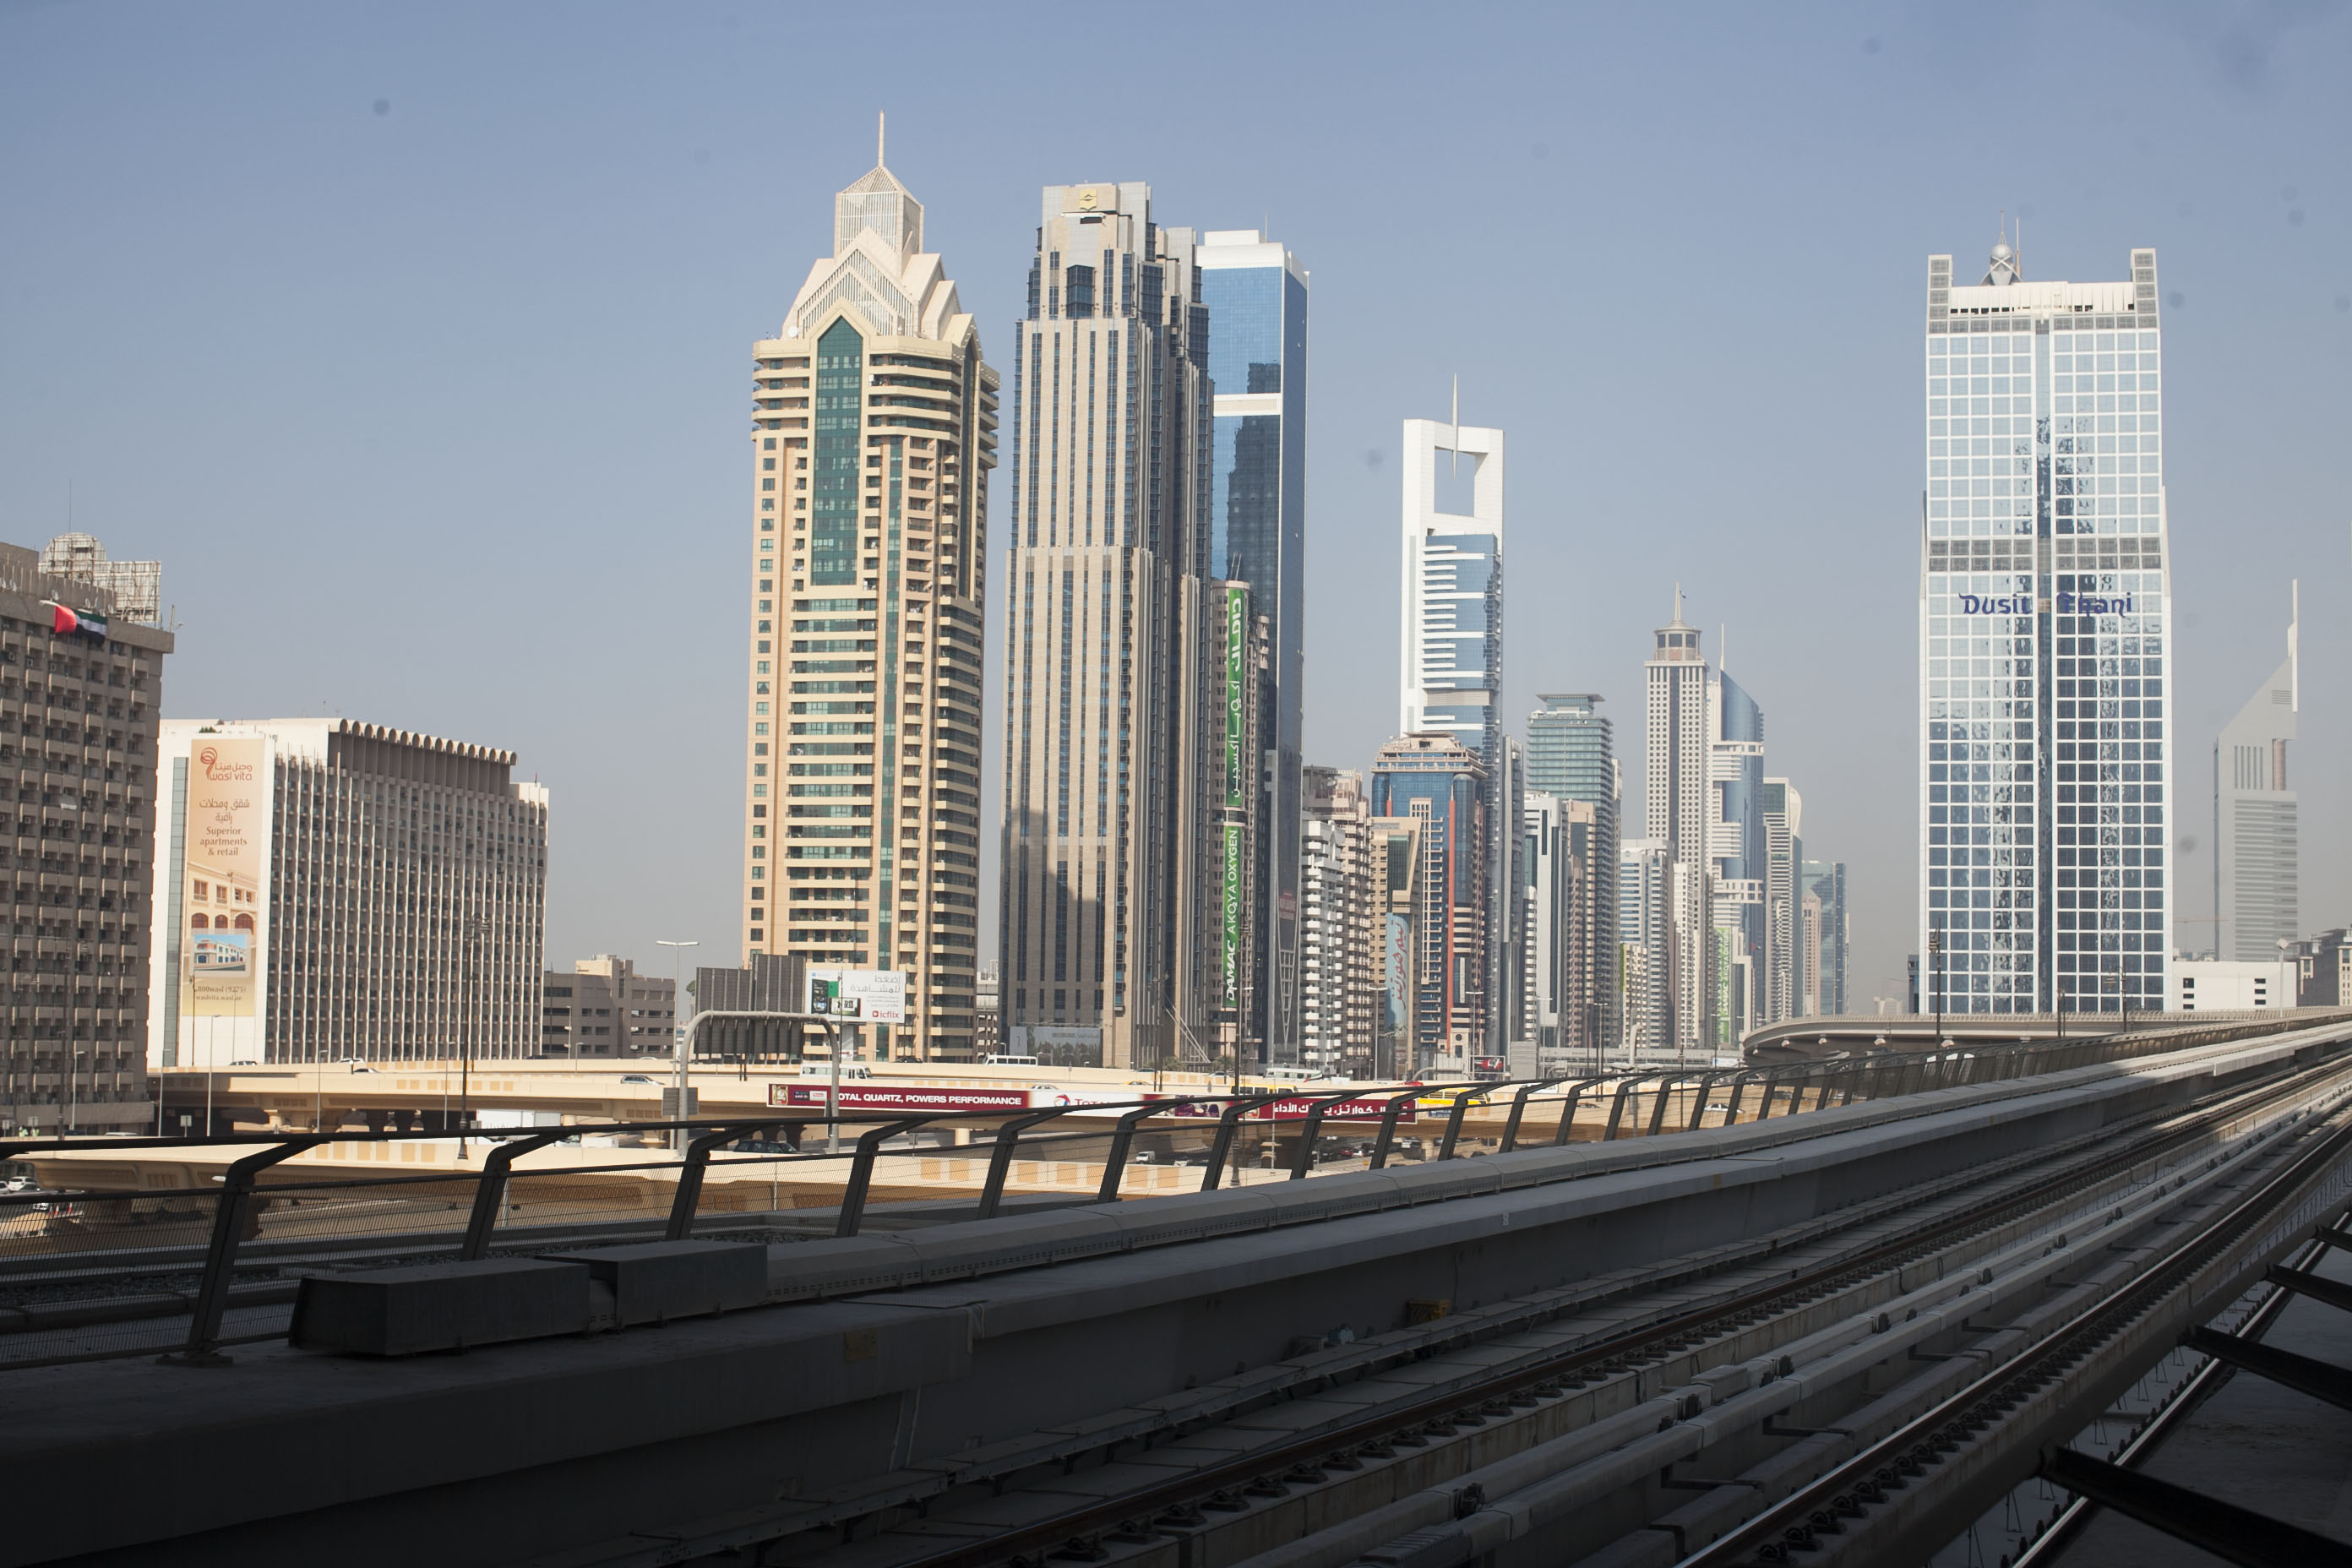 Poranek w Dubaju